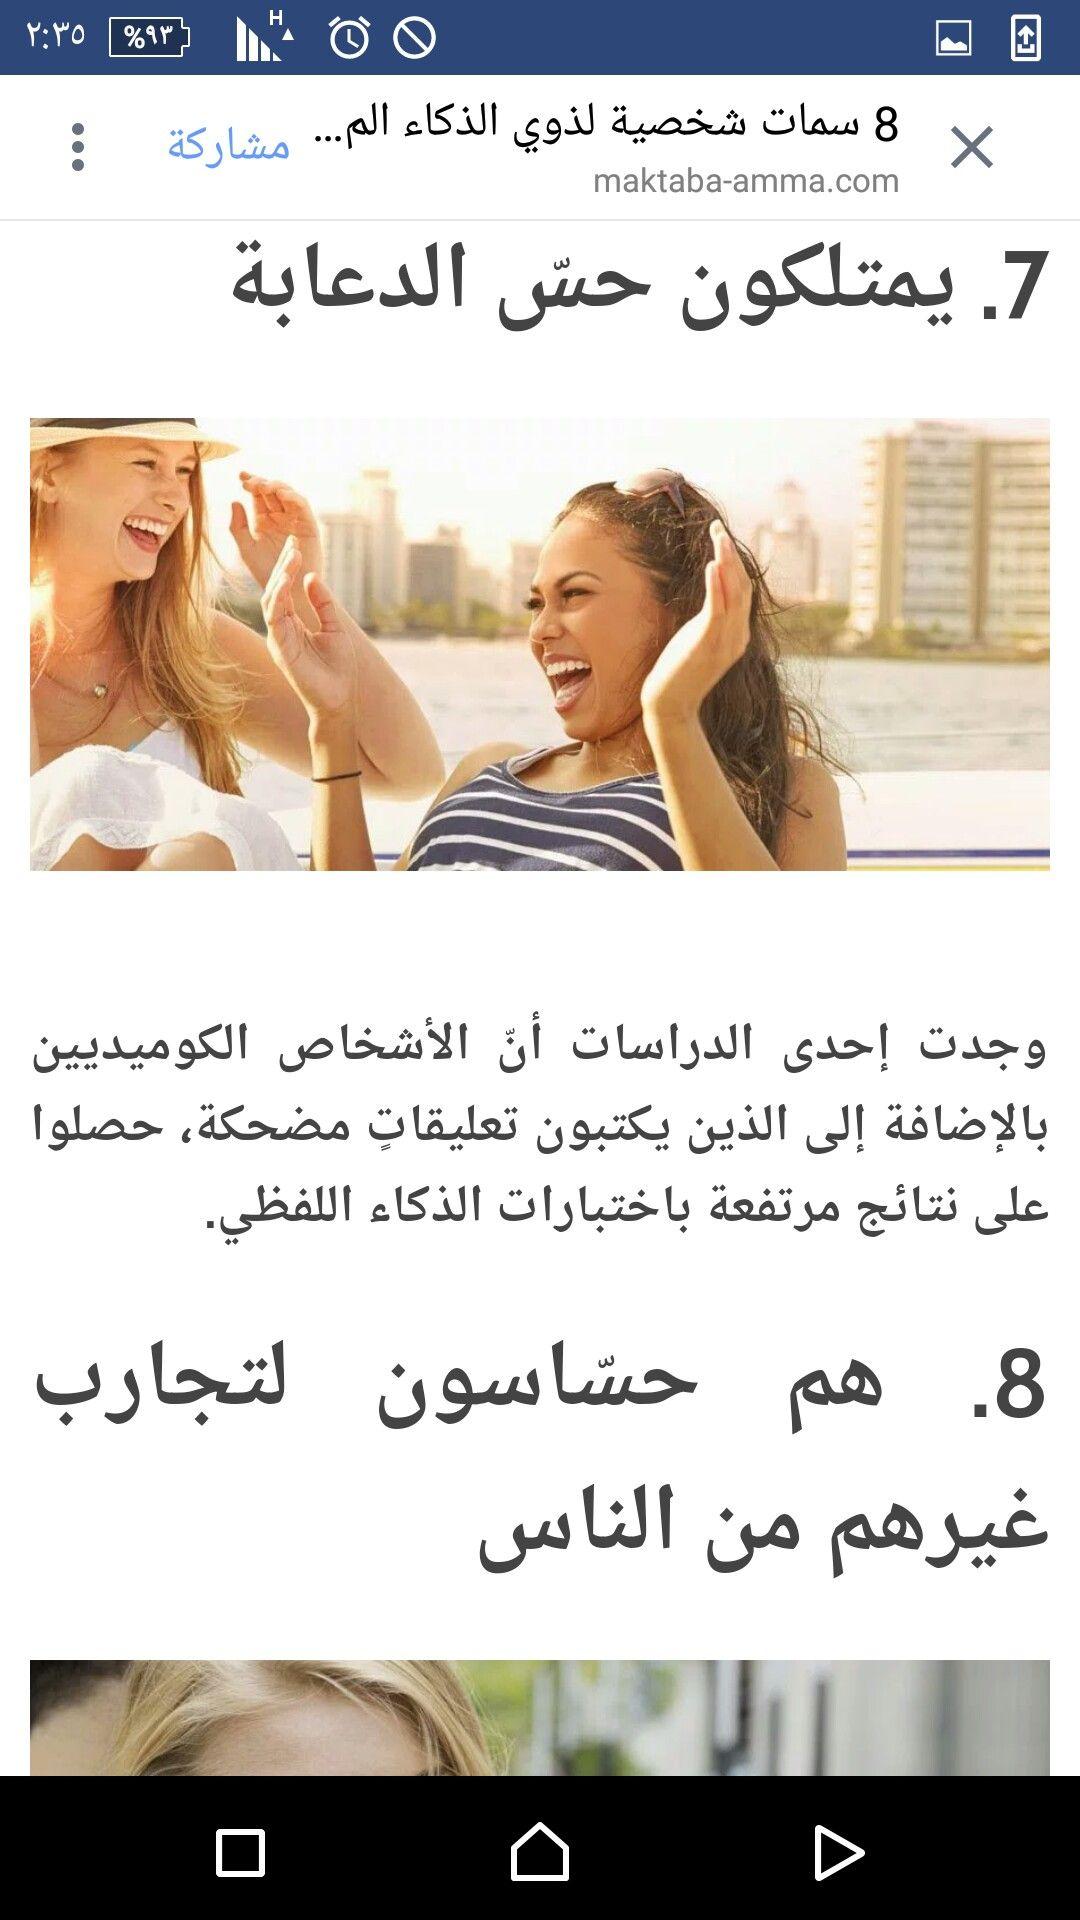 Pin by دمعه وابتسامه on الفكر الراقي ، غذاء النفوس وطب